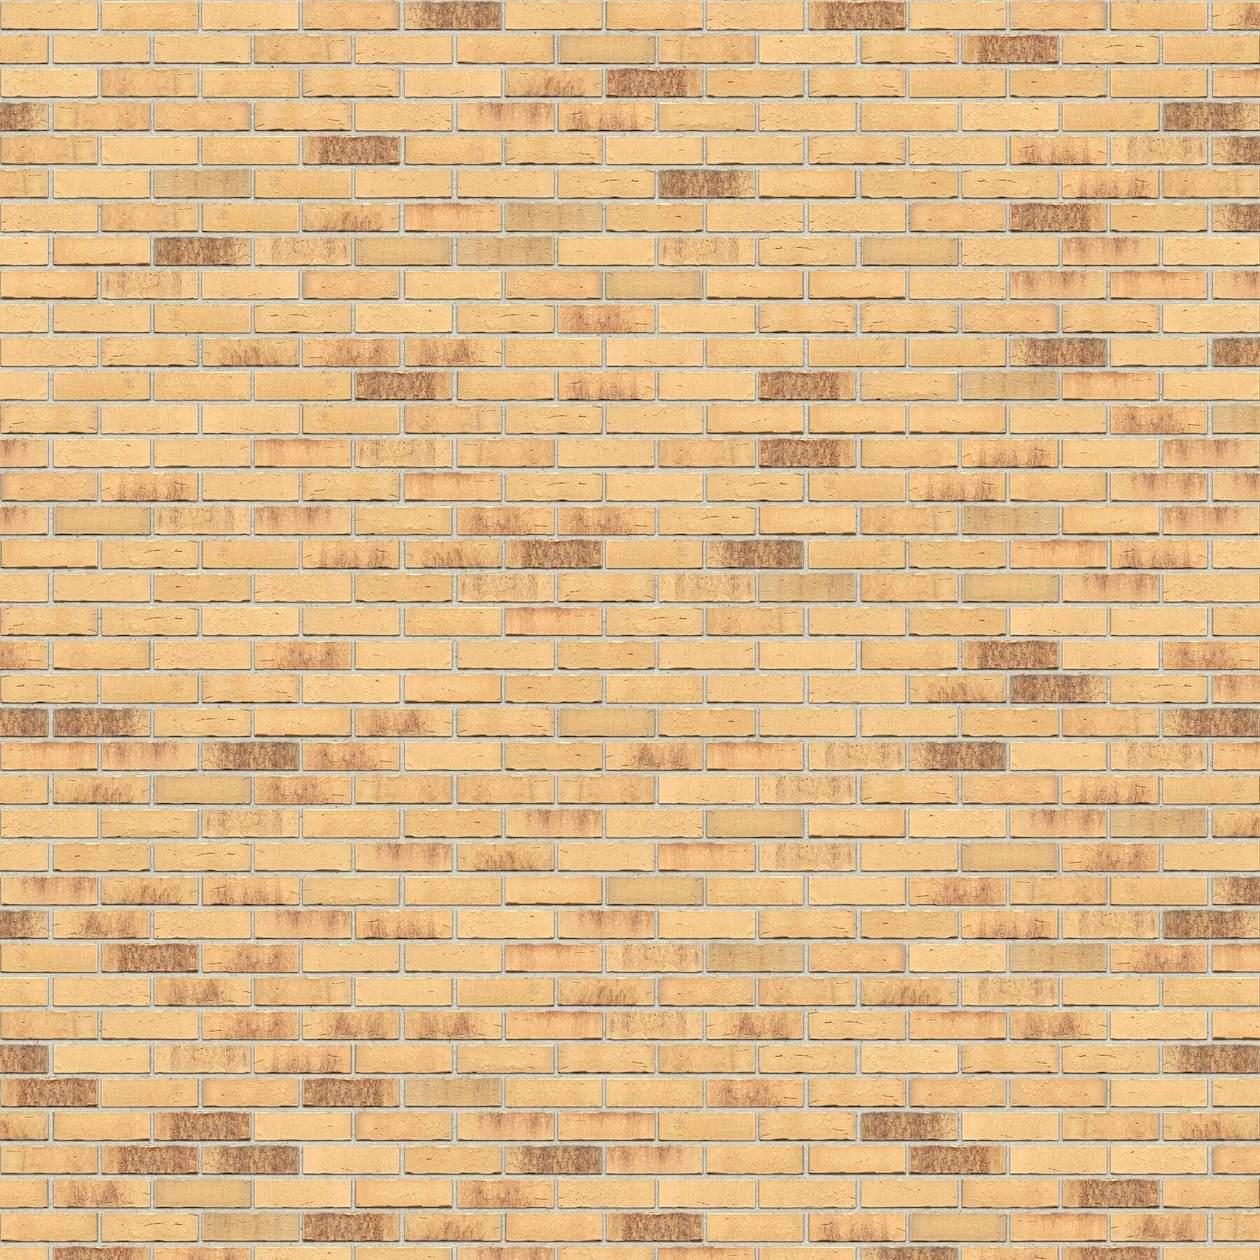 Puna-cigla-FeldHaus-Klinker-brick-house-nf-k-734-Bela Fuga